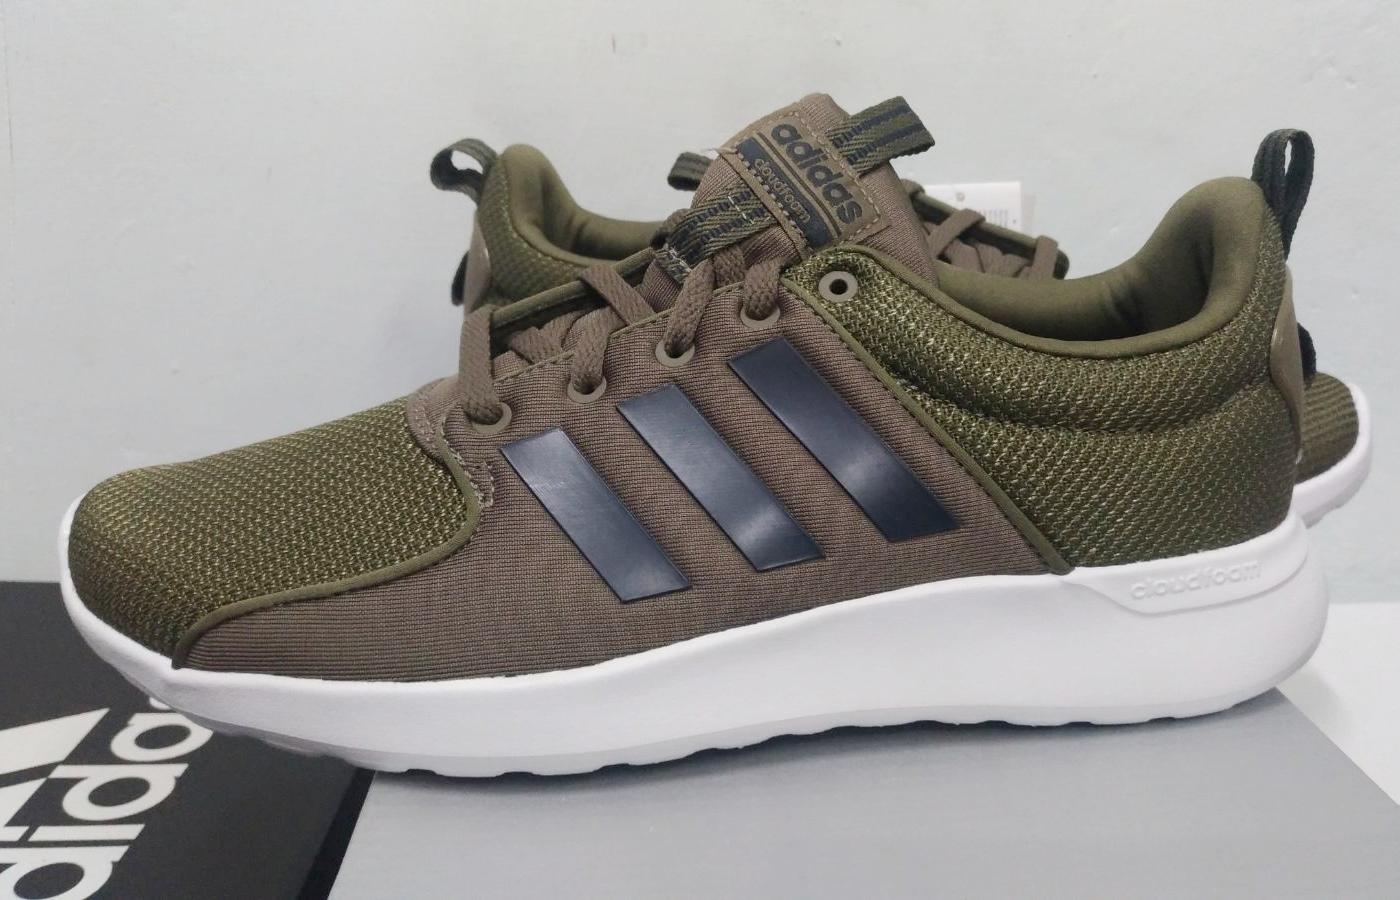 8 sur 9 Adidas Scarpe Sneakers Trainers Sportive Ginnastica Tennis Lite  Racer Verde f29a8be5eaca1